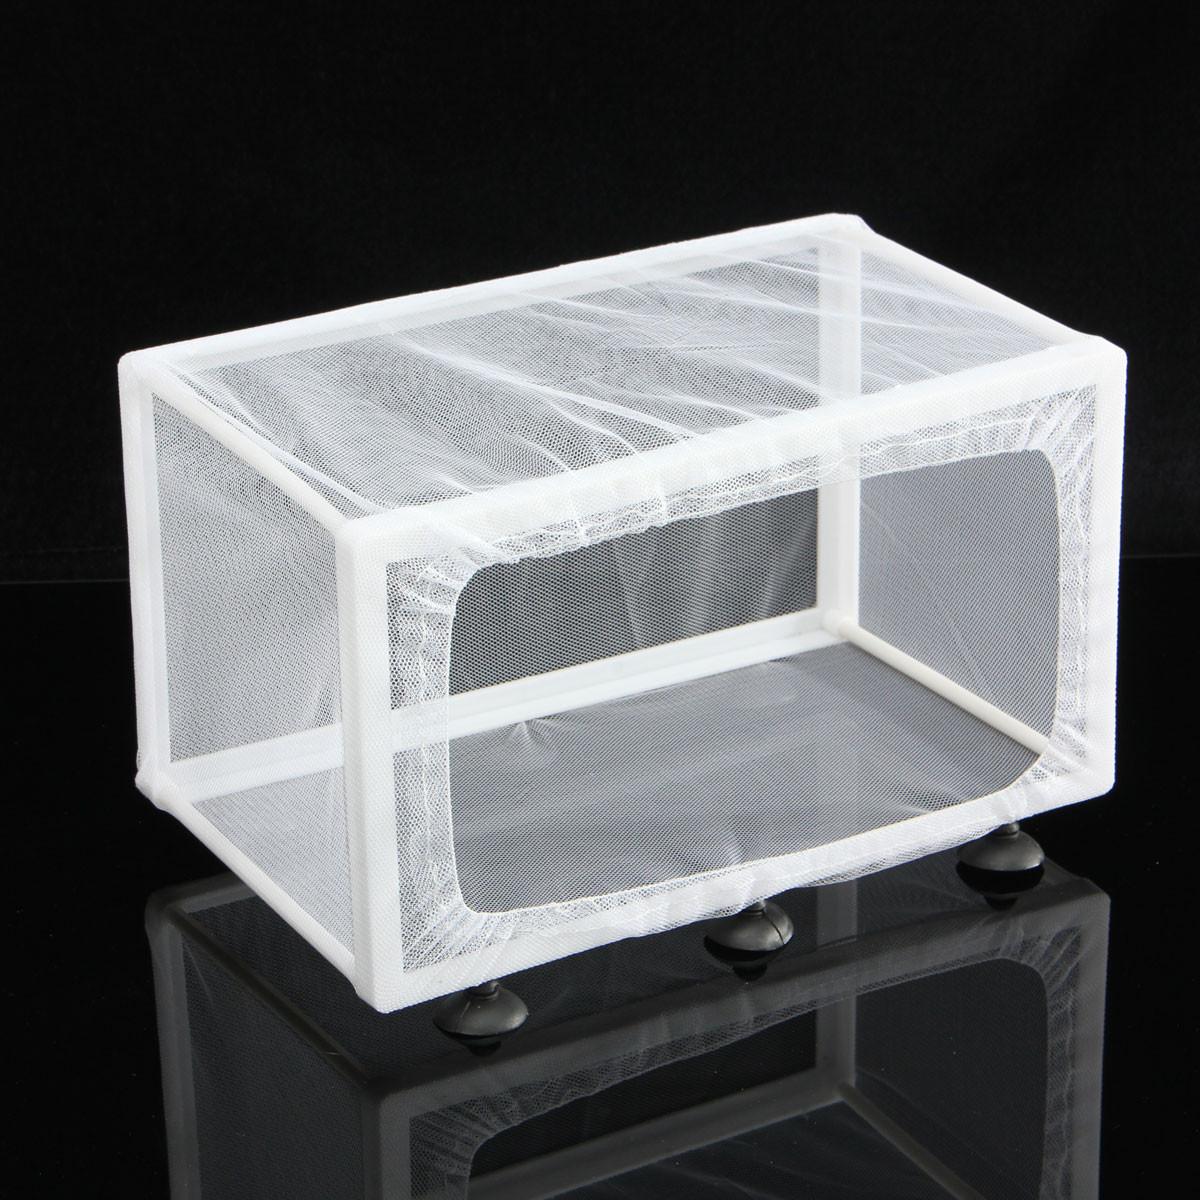 Aquarium fish tank fry net breeder breeding hatchery - 1 X Aquarium Net Breeder 1 X White Polyester Net 6 X Suction Cups